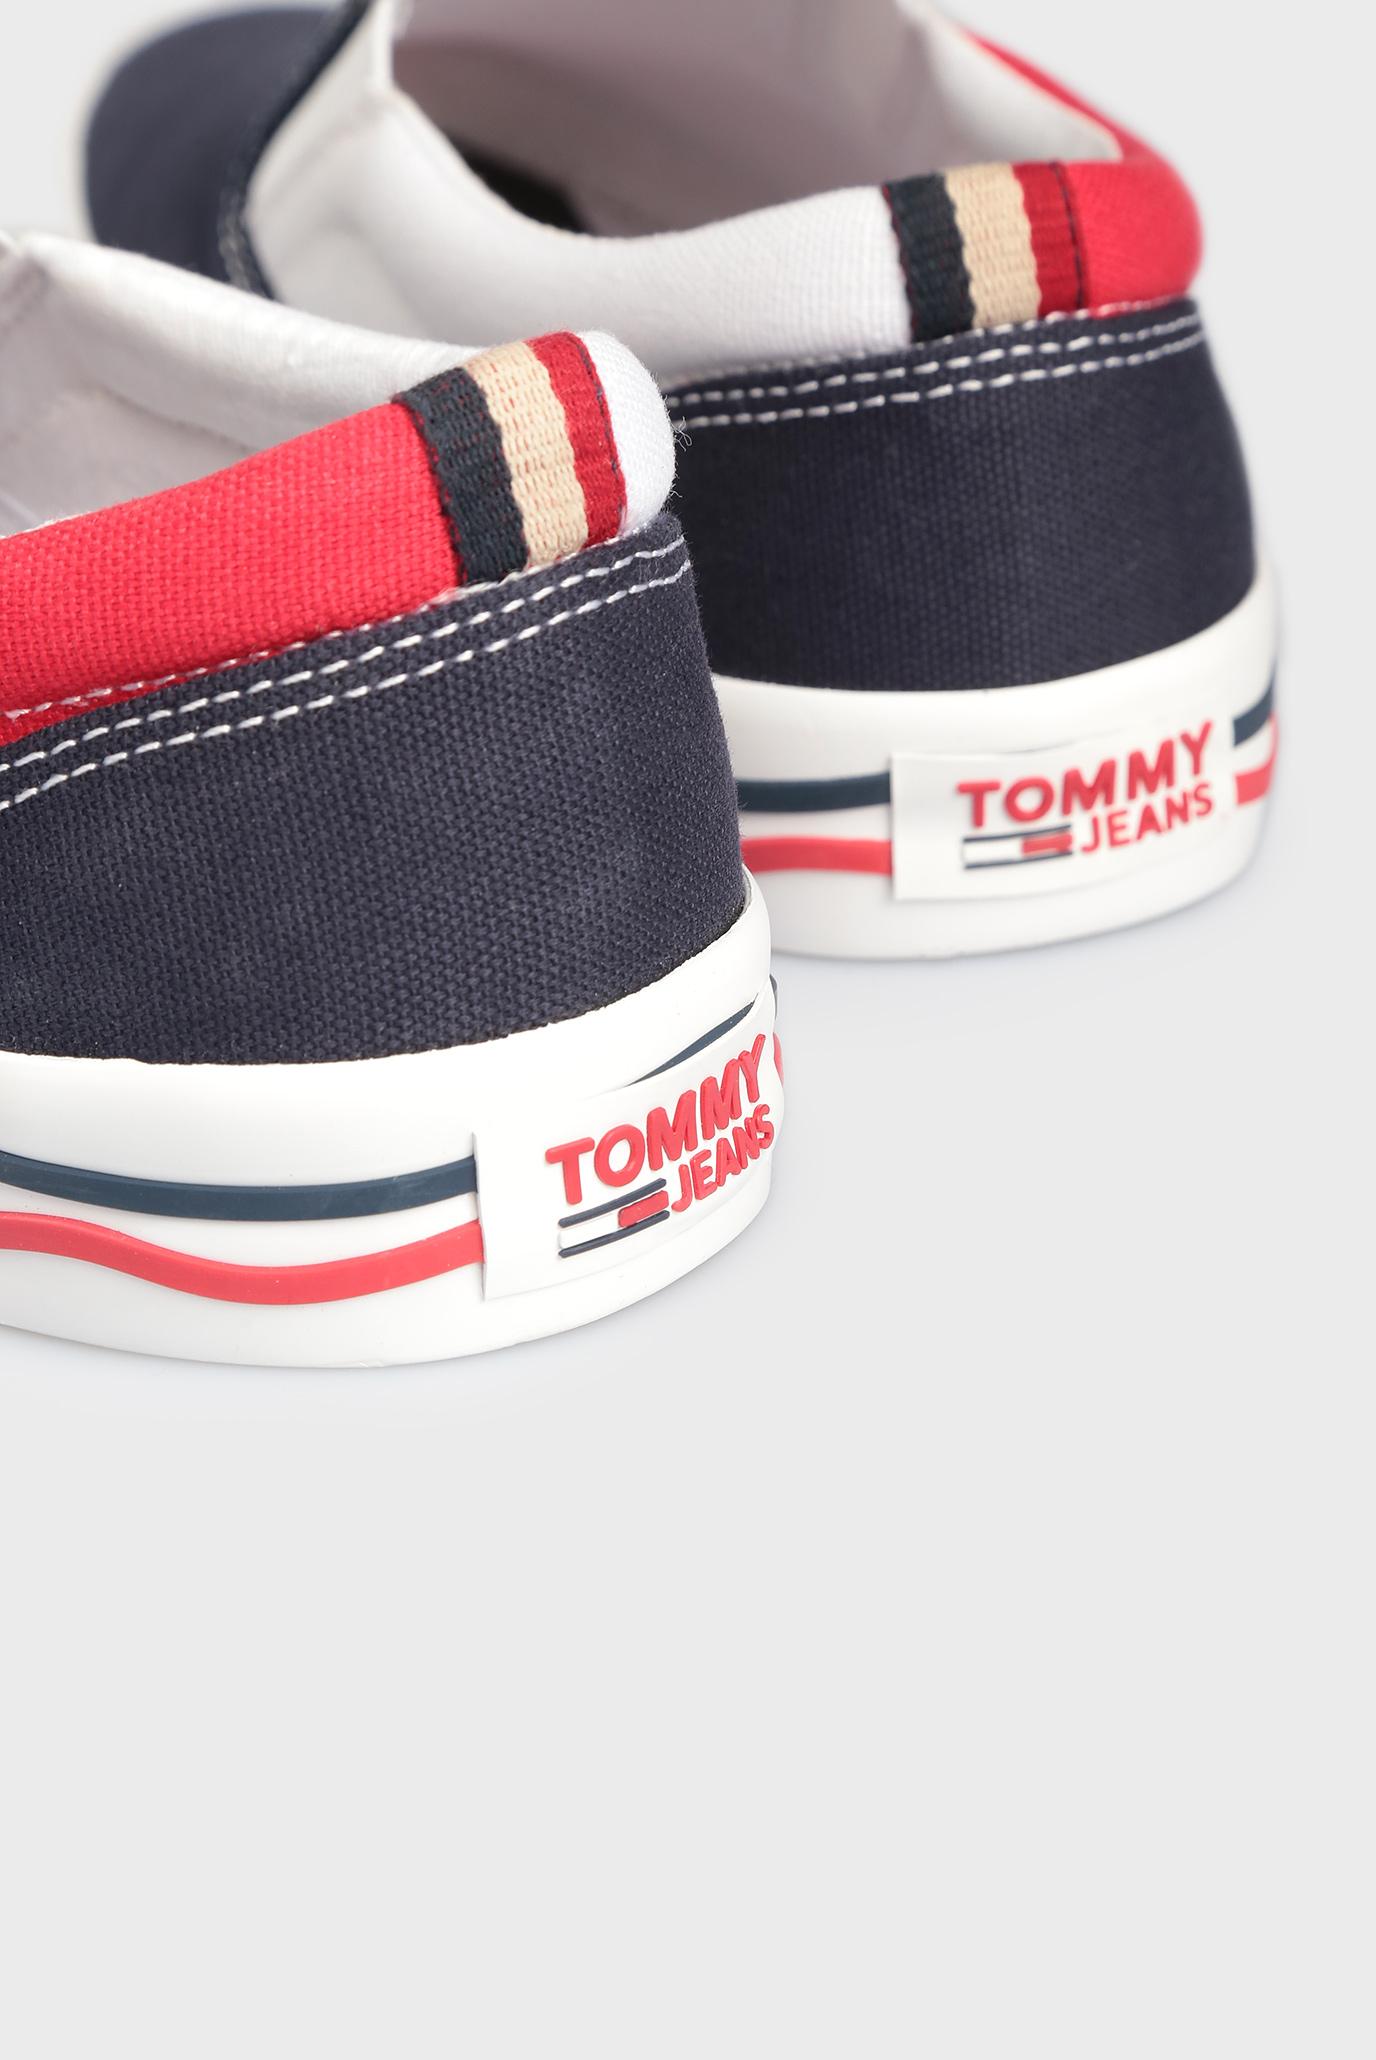 9ff9b6ebfb8e Купить Мужские темно-синие слипоны Tommy Hilfiger Tommy Hilfiger ...